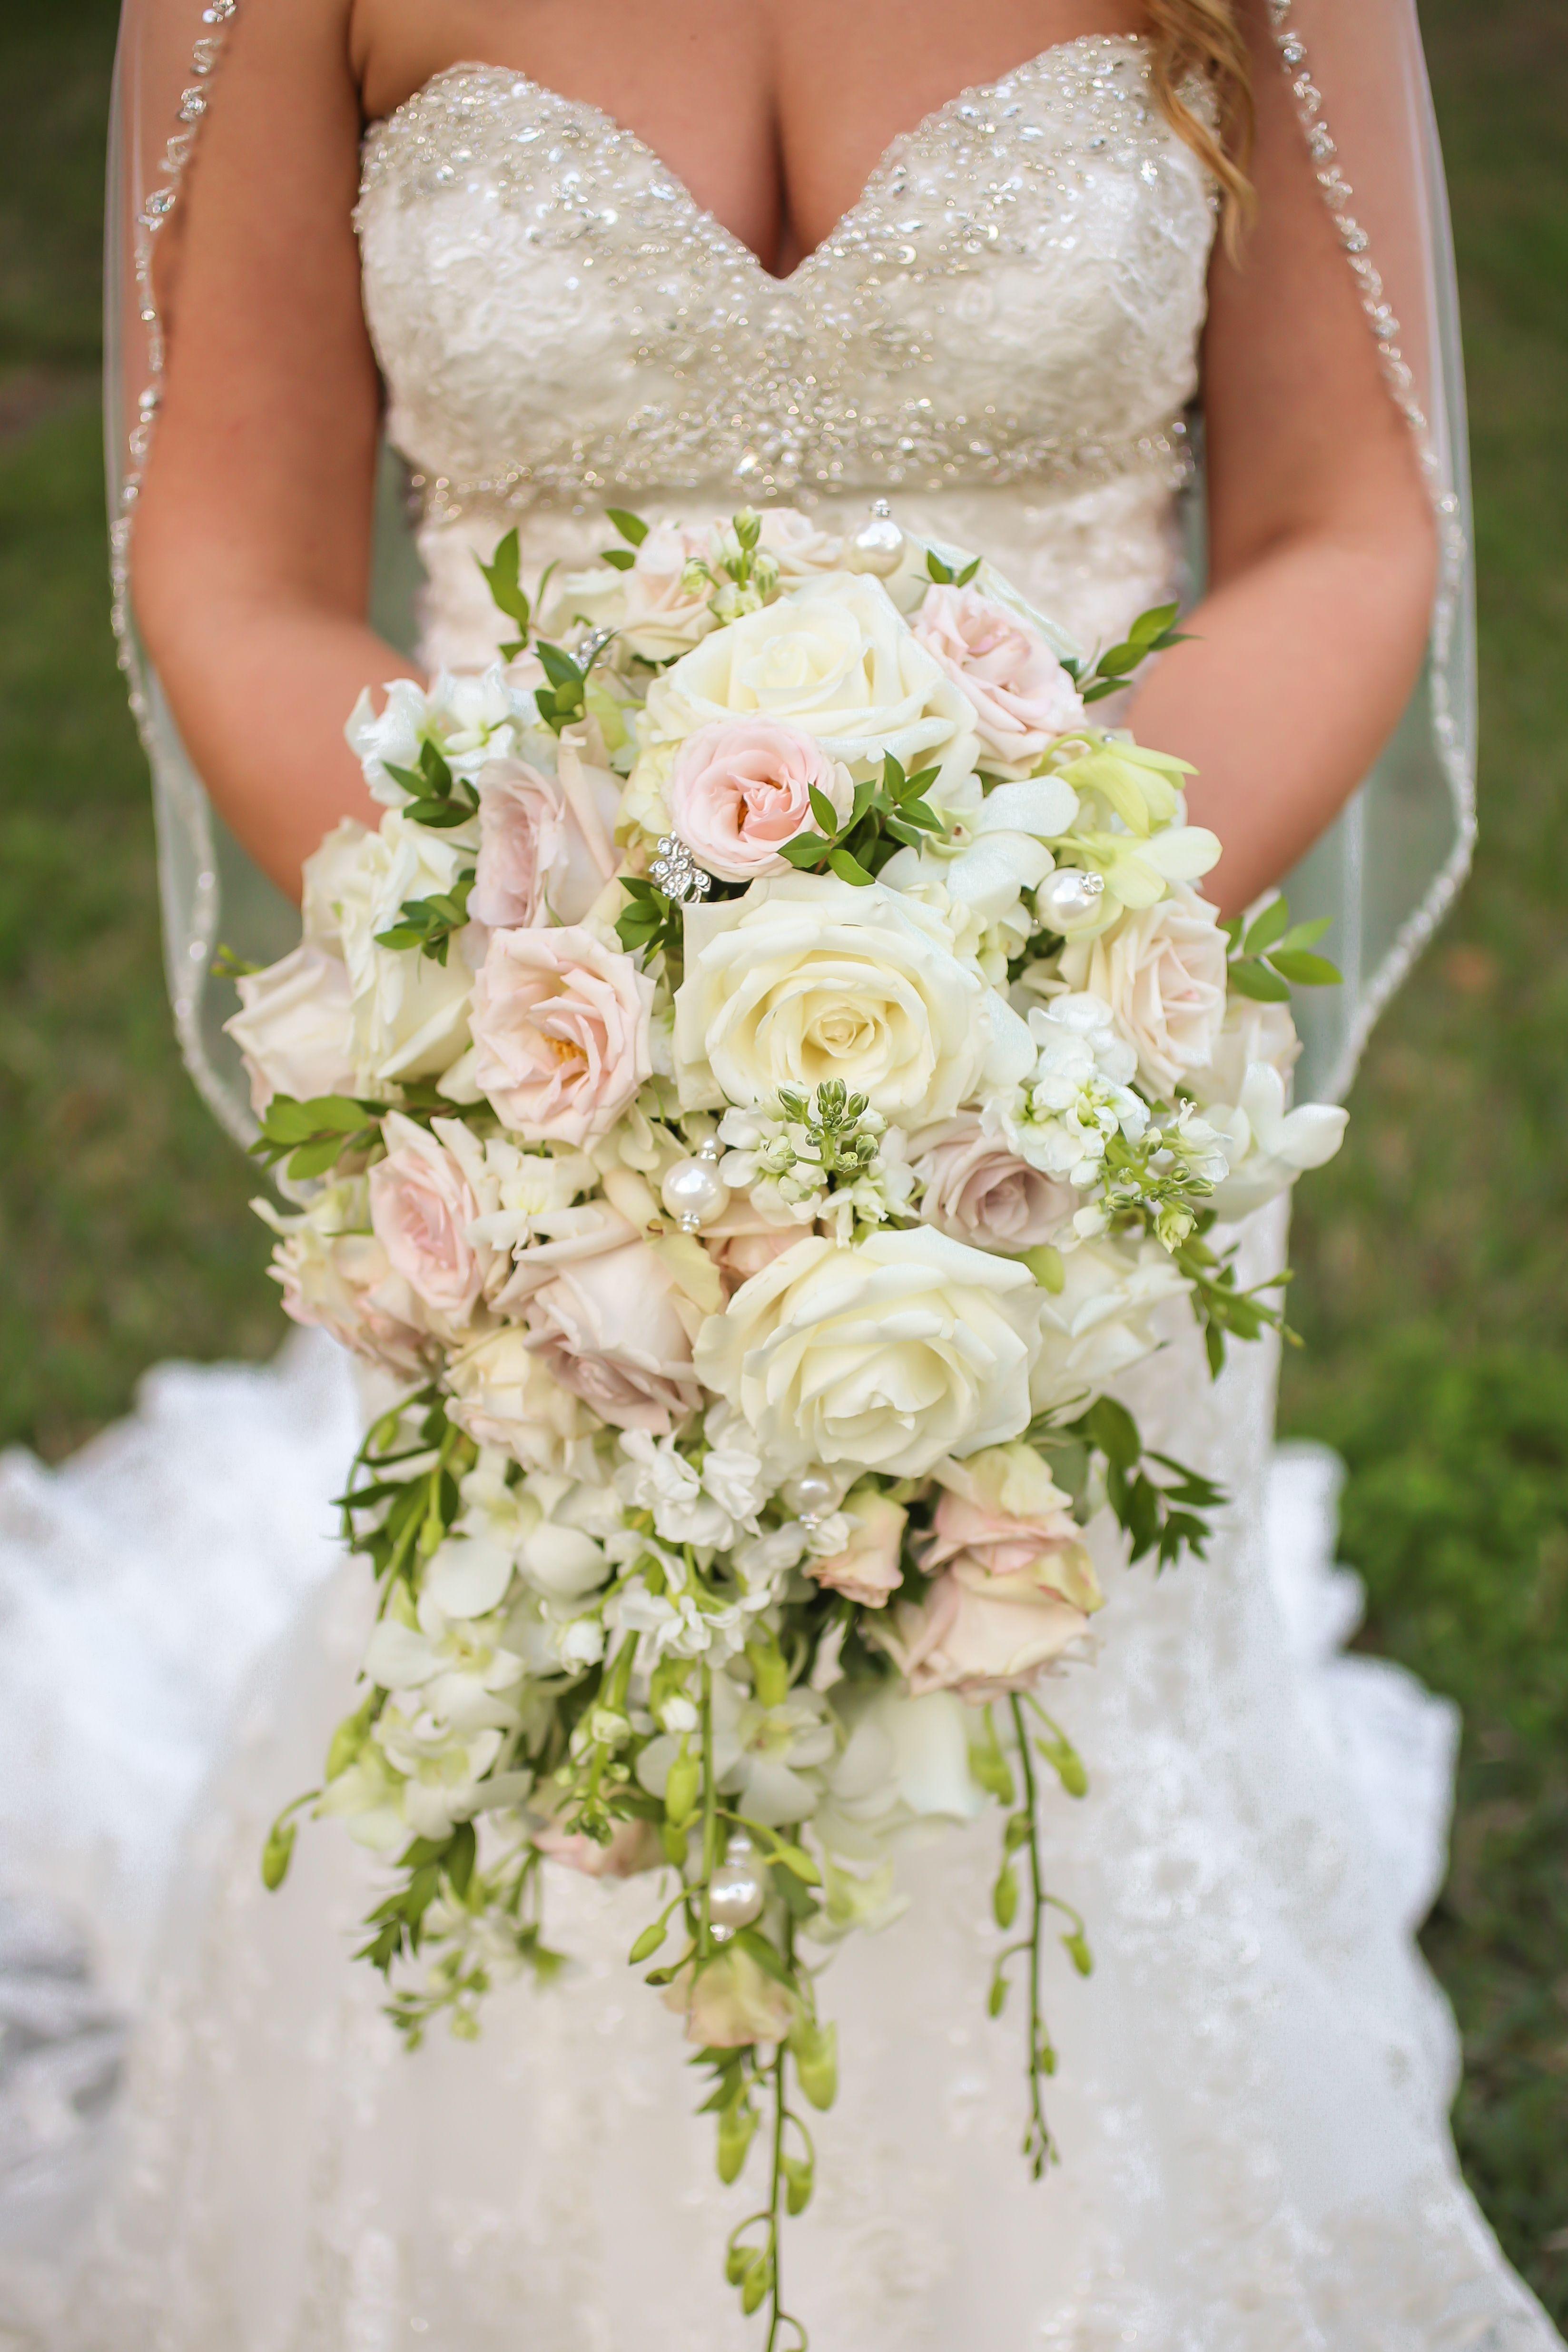 Cascading mauve and white rose bouquet wedding bouquets